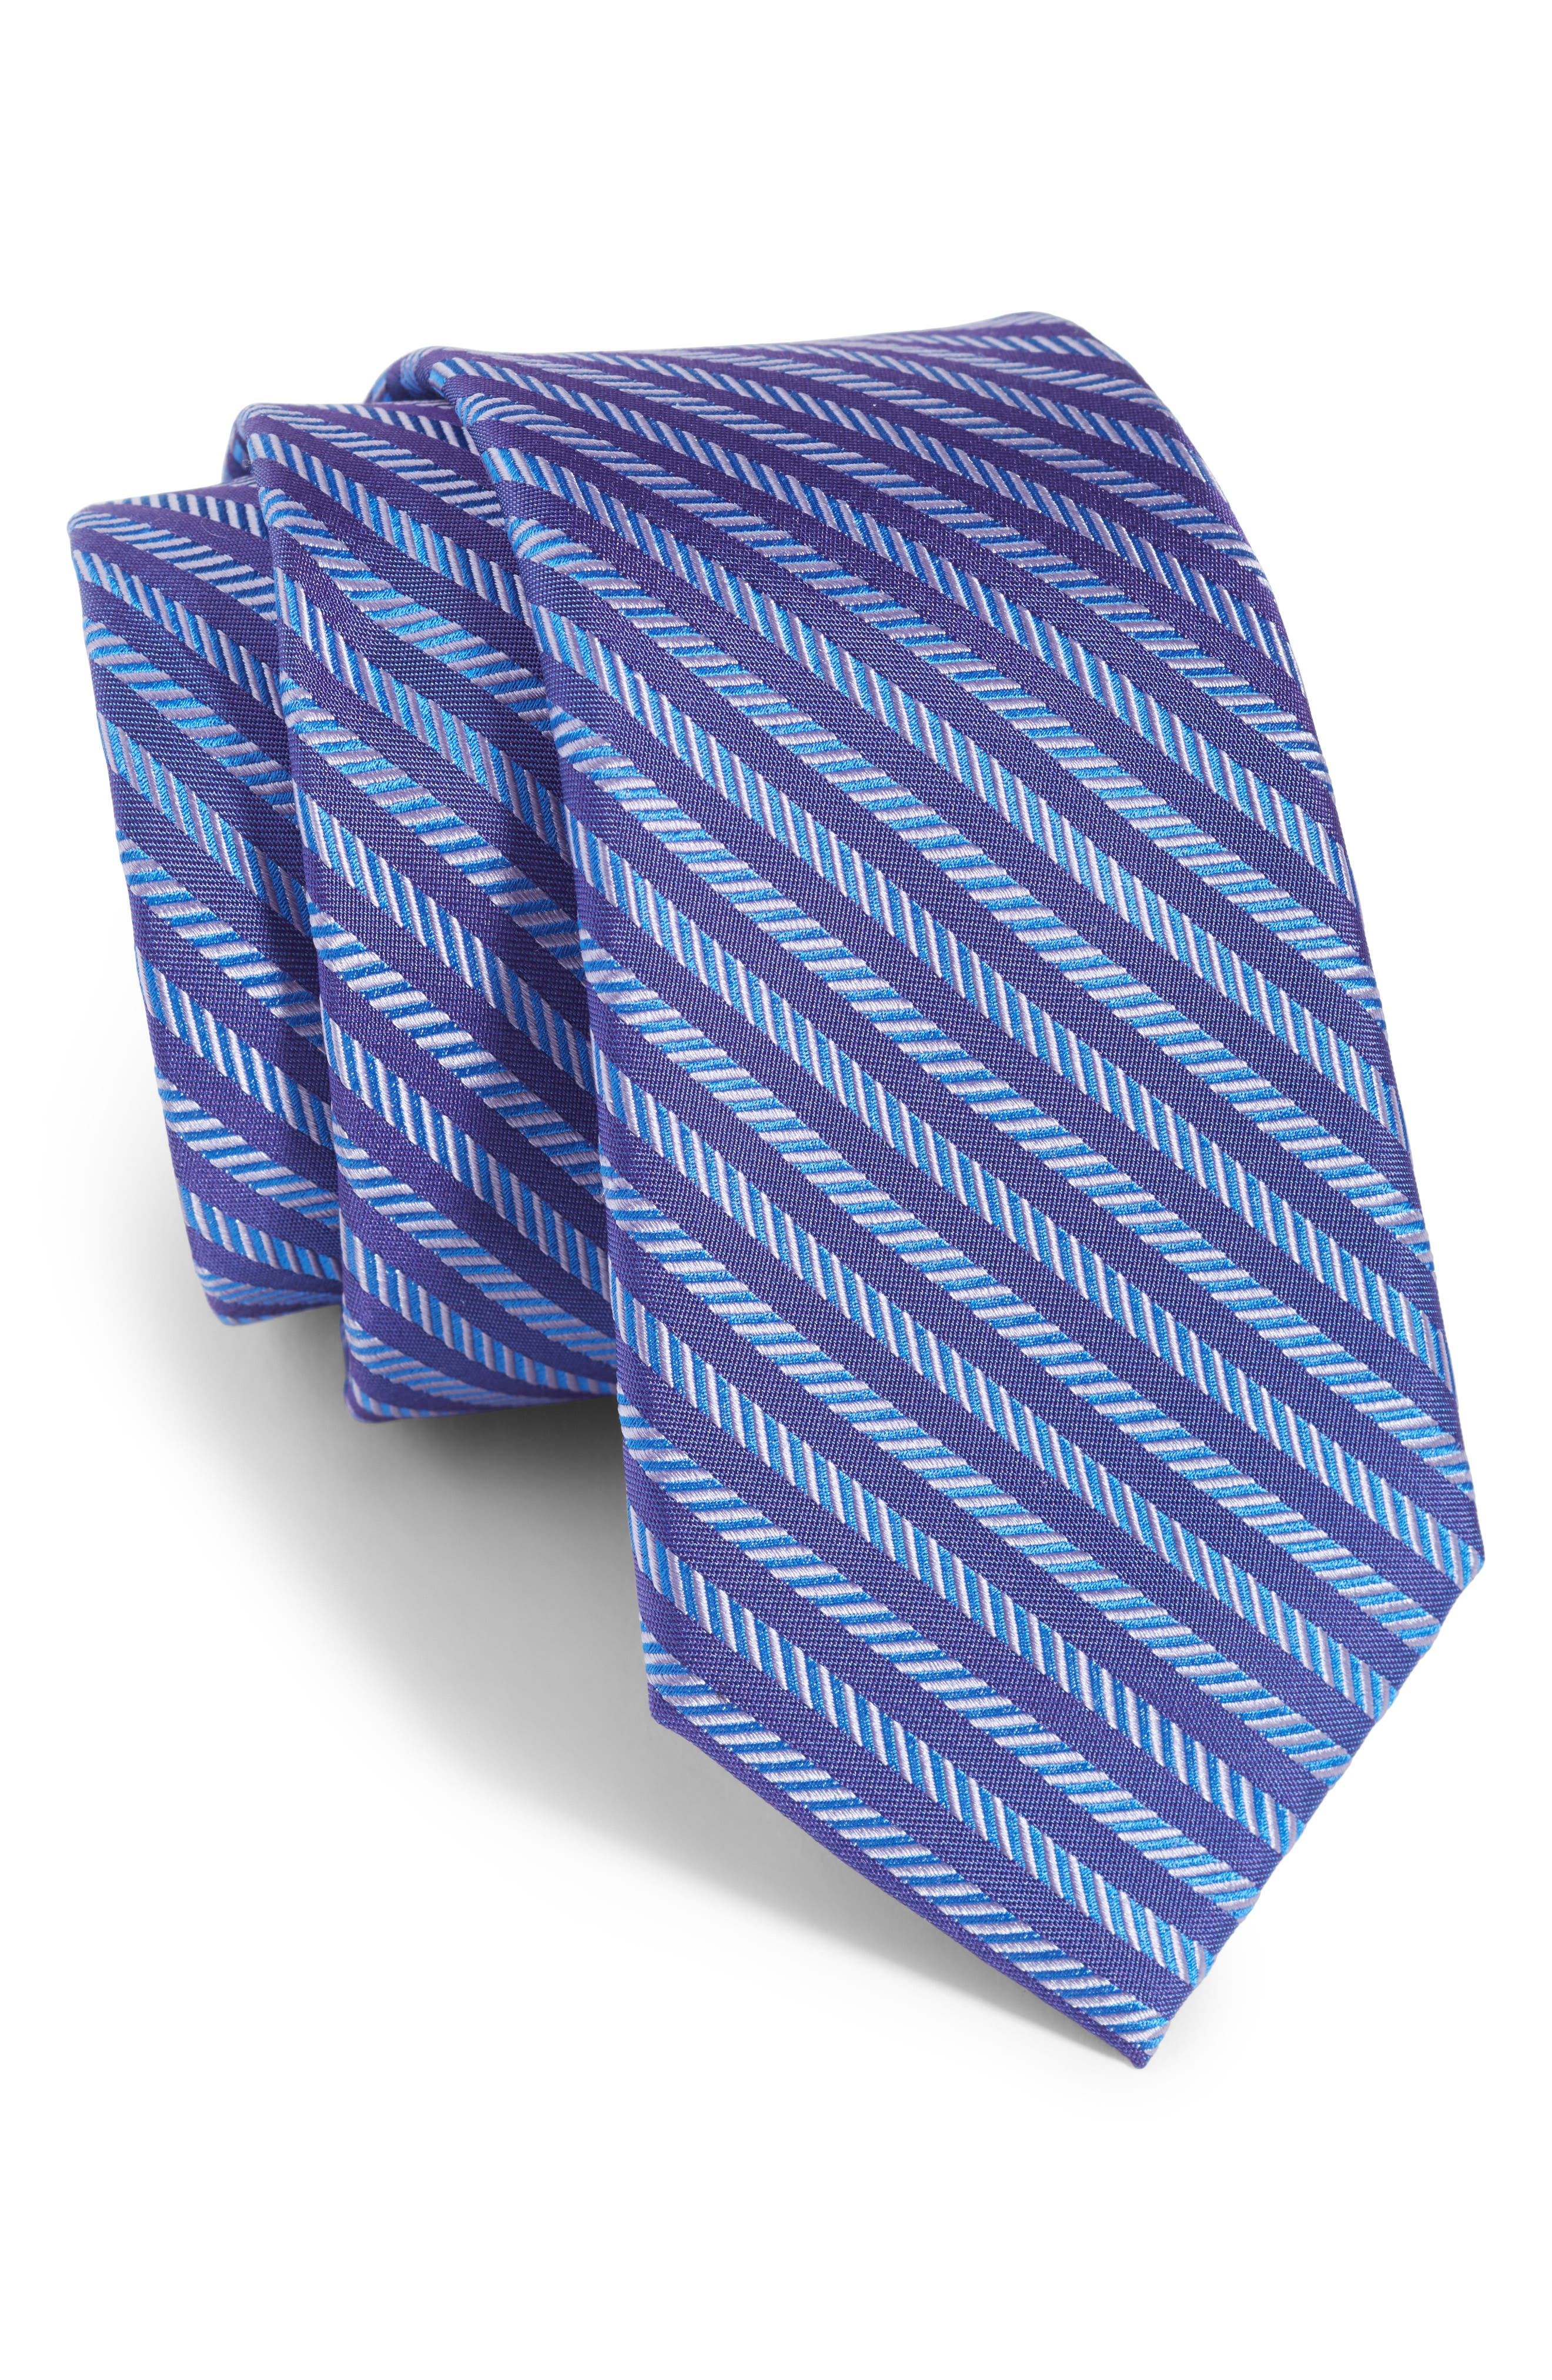 Michael Kors Herringbone Stripe Silk Tie (Boys)